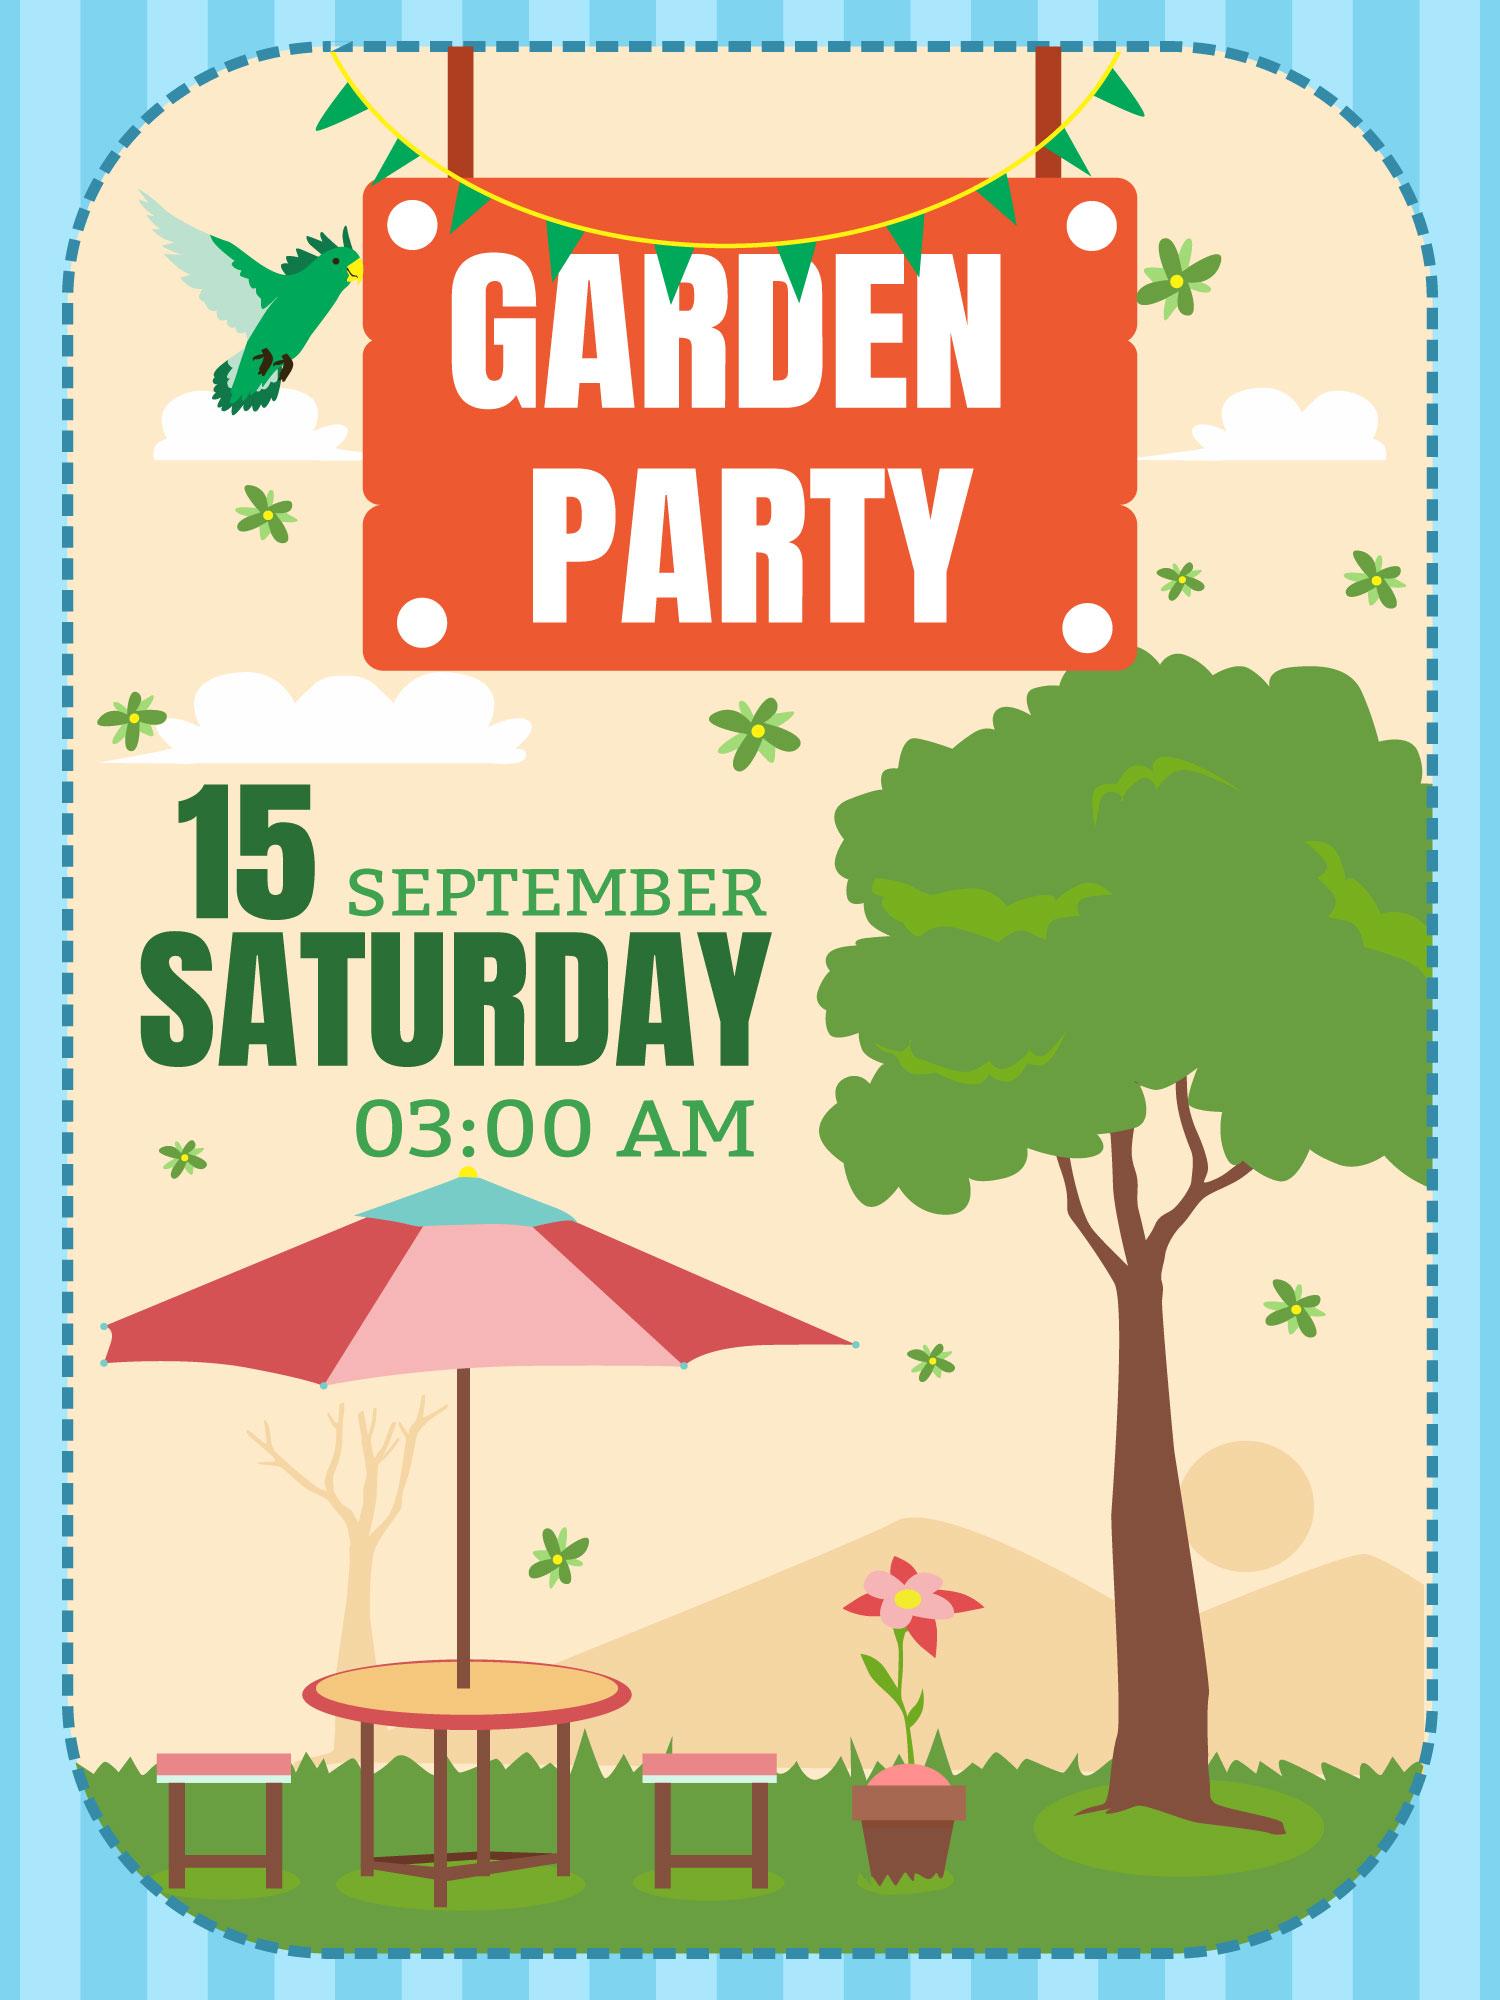 Striped Garden Party Invitation Vector - Download Free Vector Art ...